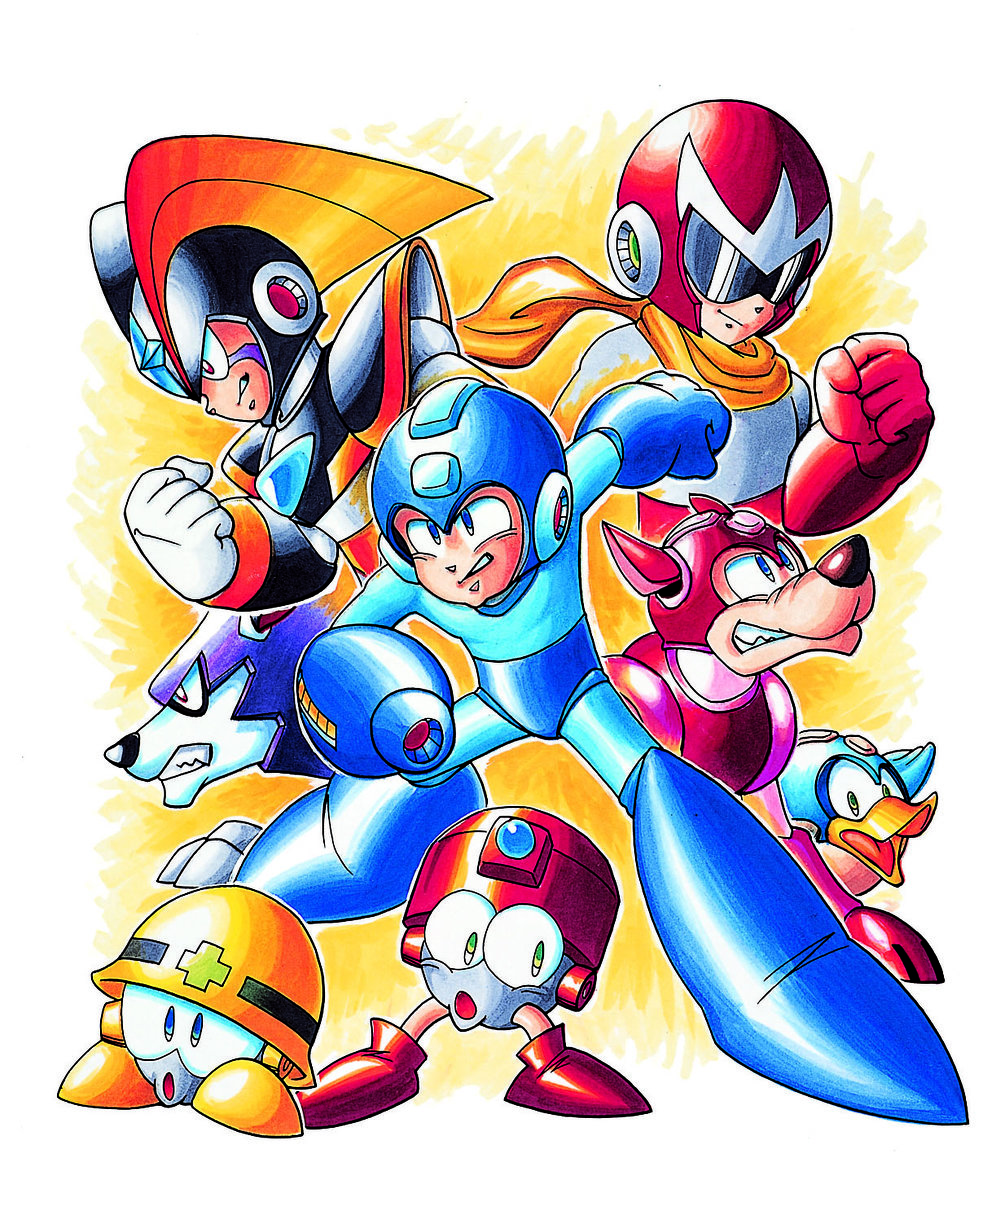 MMLC2_-_Museum_Art_-_Mega_Man_7.jpg